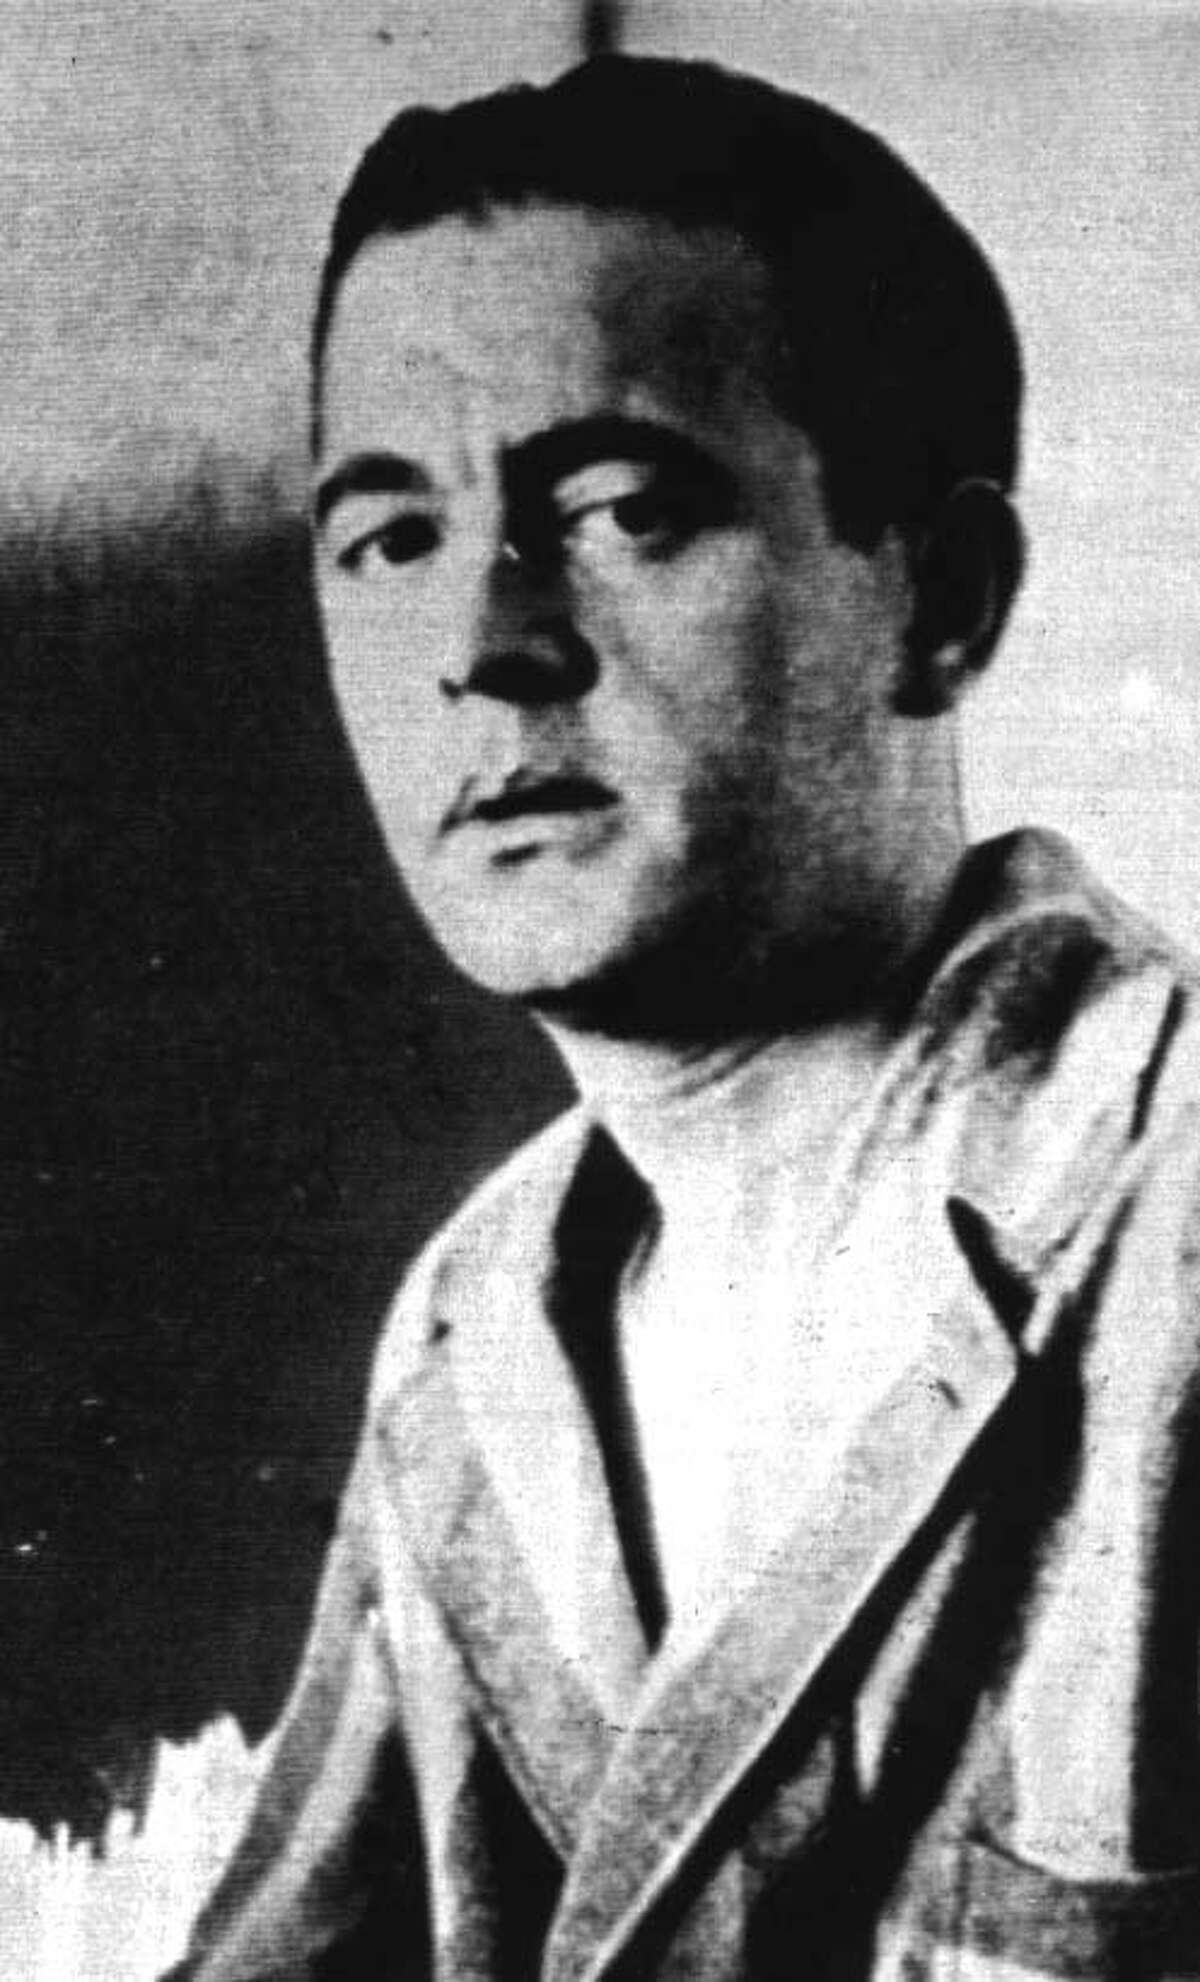 Dapper Jack 'Legs' Diamond, undated. (Times Union archive)